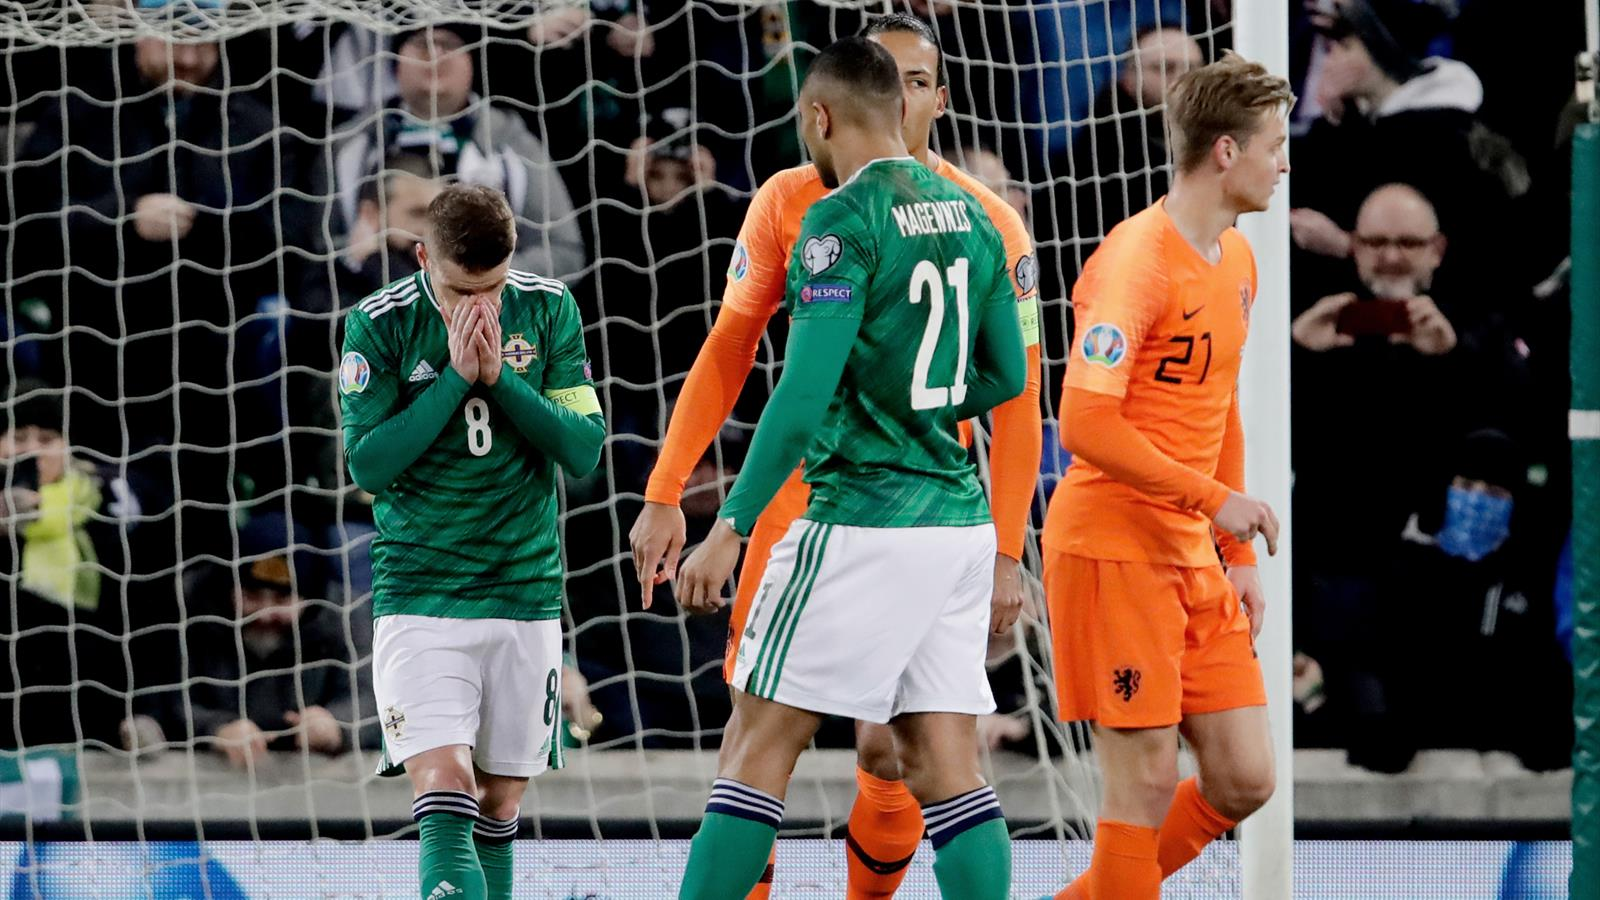 Calendrier De Match Euro 2020.Football News Northern Ireland Penalty Heartbreak As